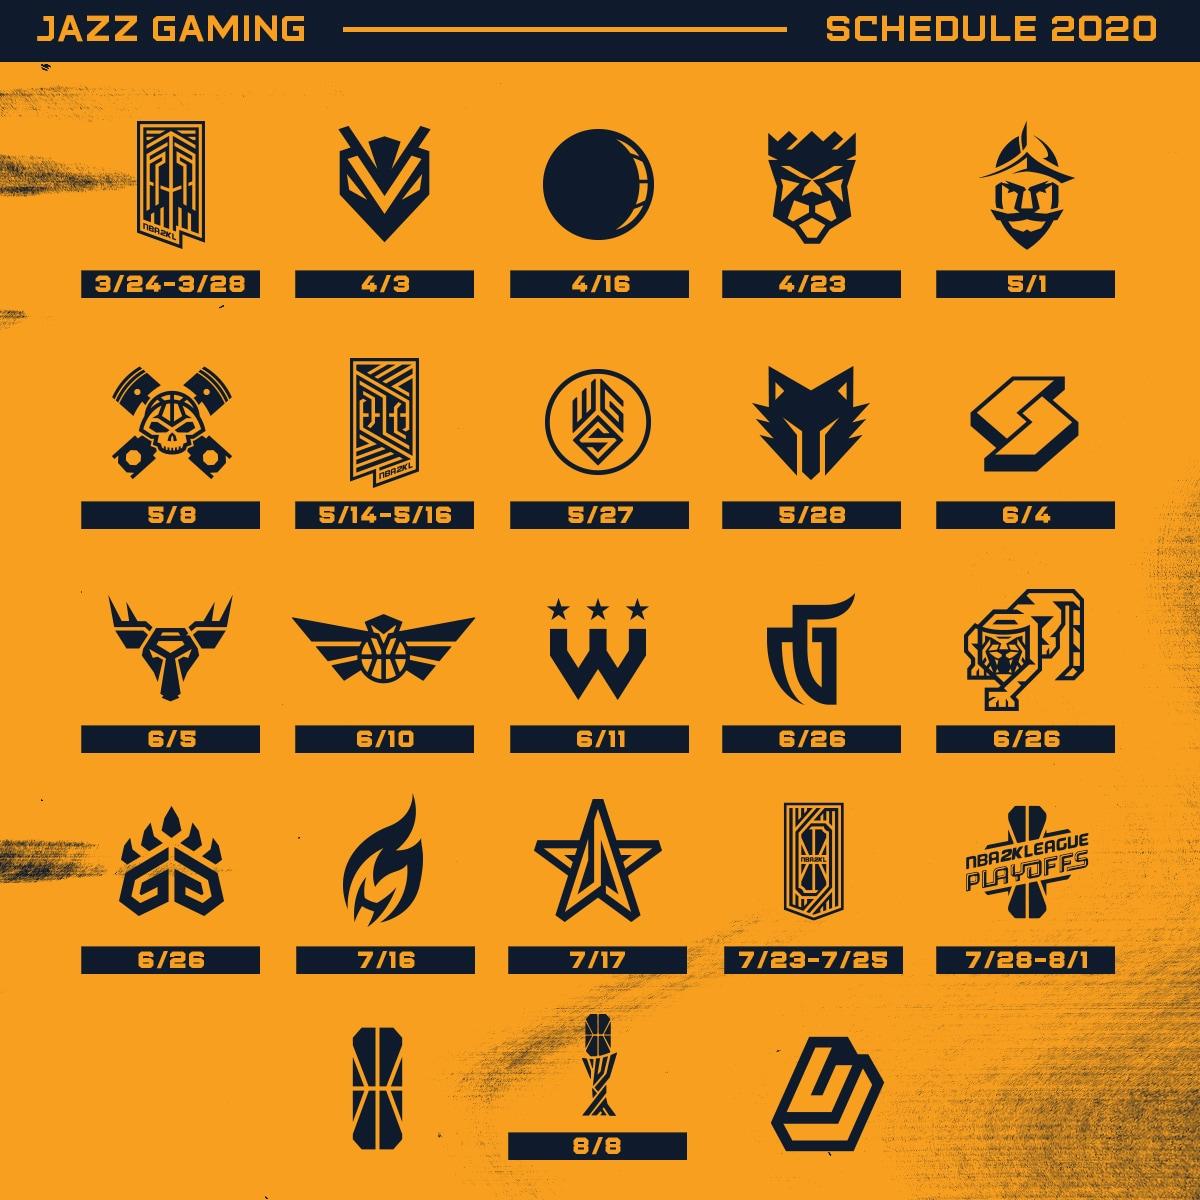 Gaming_ScheduleRelease_1200x1200_ALL